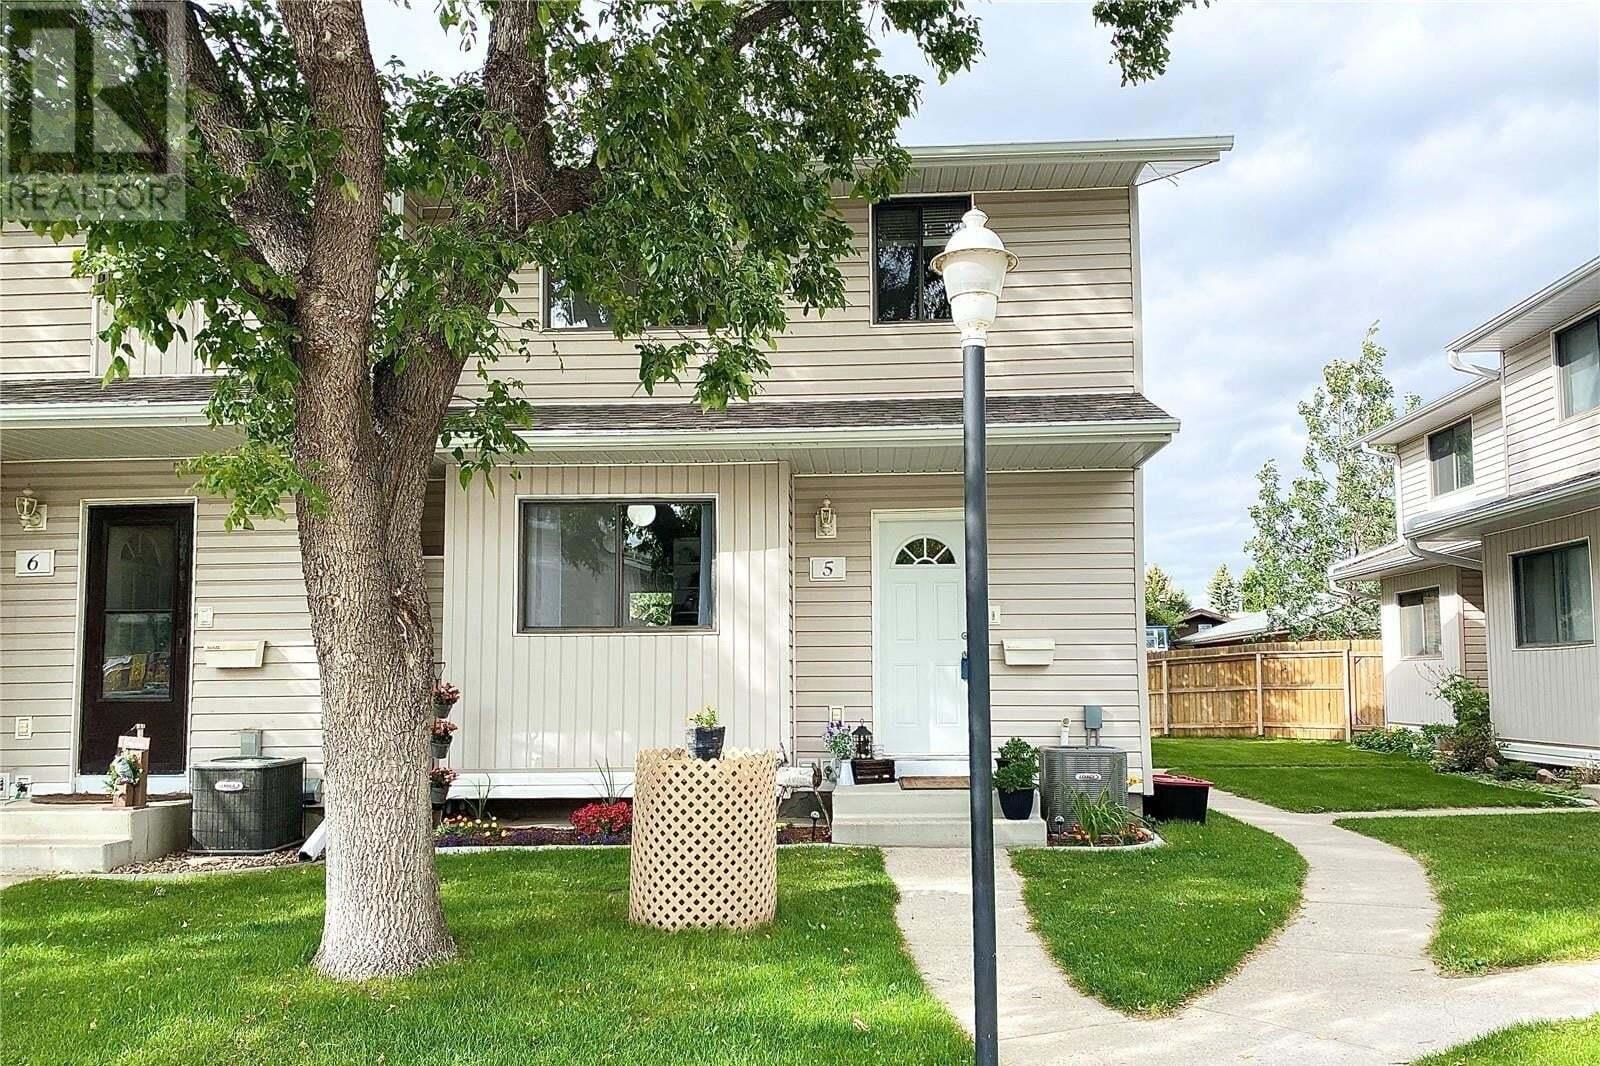 Townhouse for sale at 330 Haight Cres Unit 5 Saskatoon Saskatchewan - MLS: SK828072